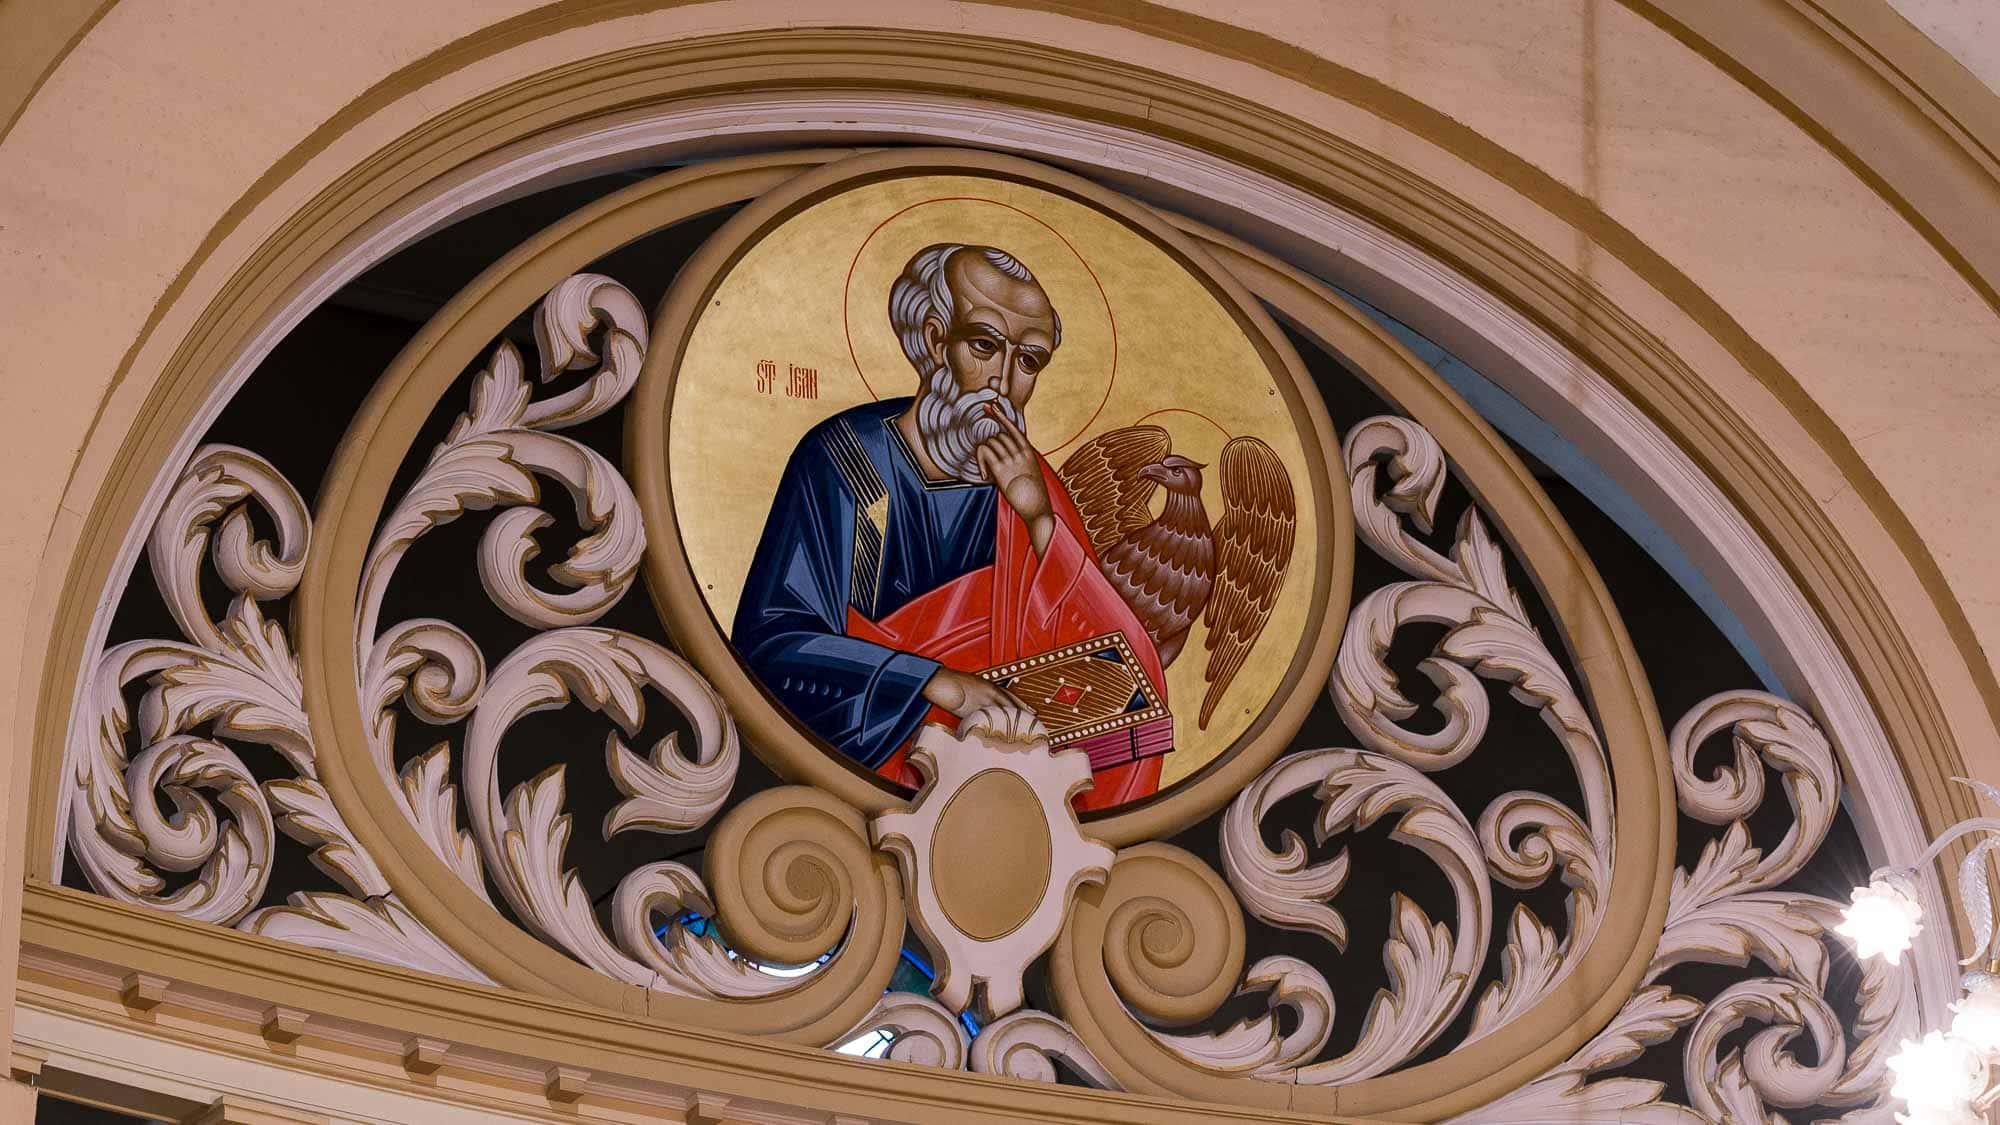 st-jean-cathedrale saint jerome